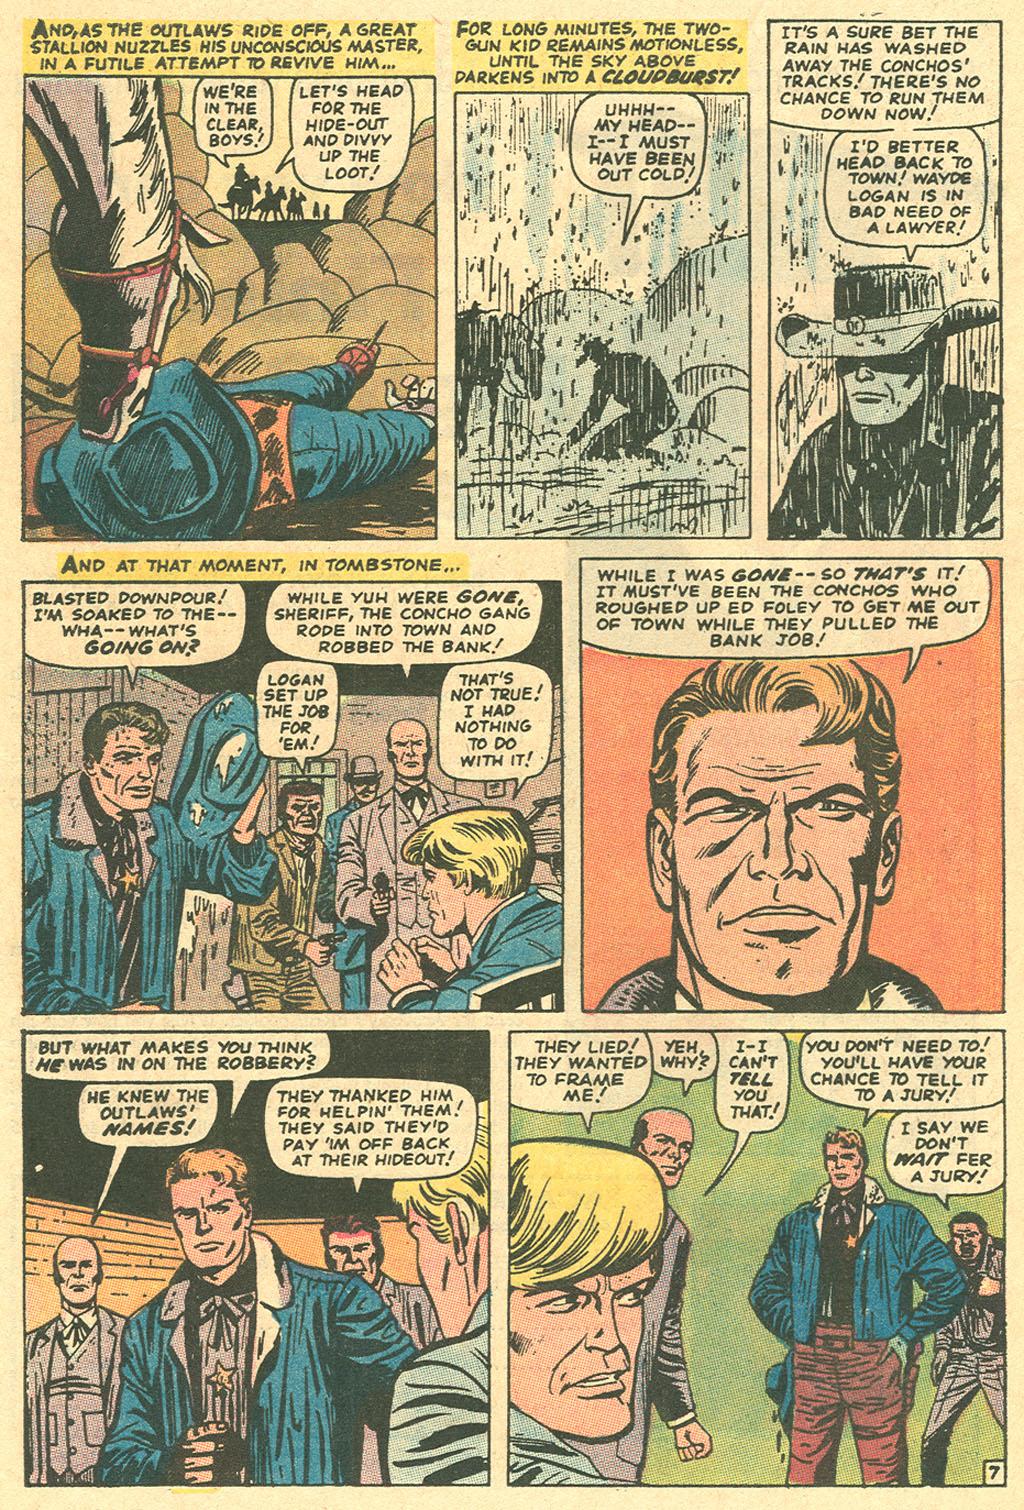 Read online Two-Gun Kid comic -  Issue #96 - 12